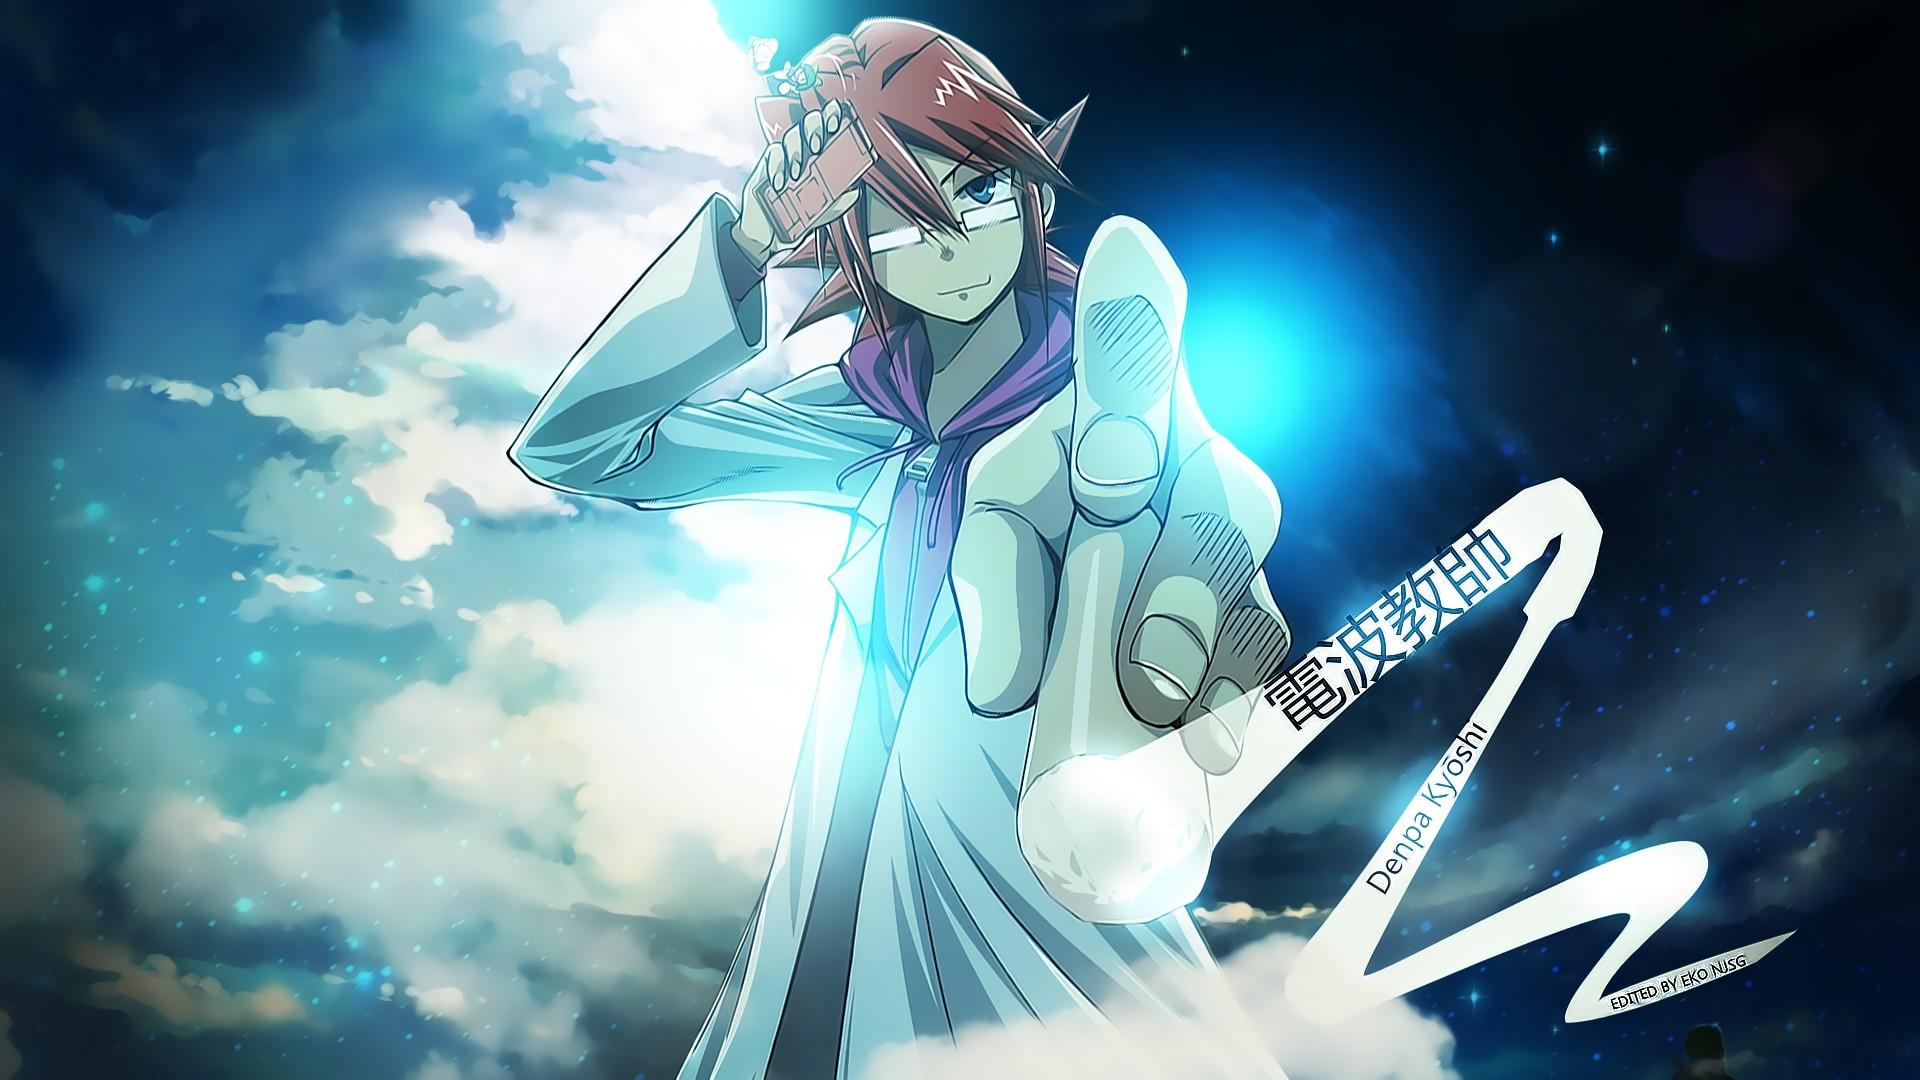 Wallpaper Illustration Anime Denpa Ky Shi Kagami Jun Ichir